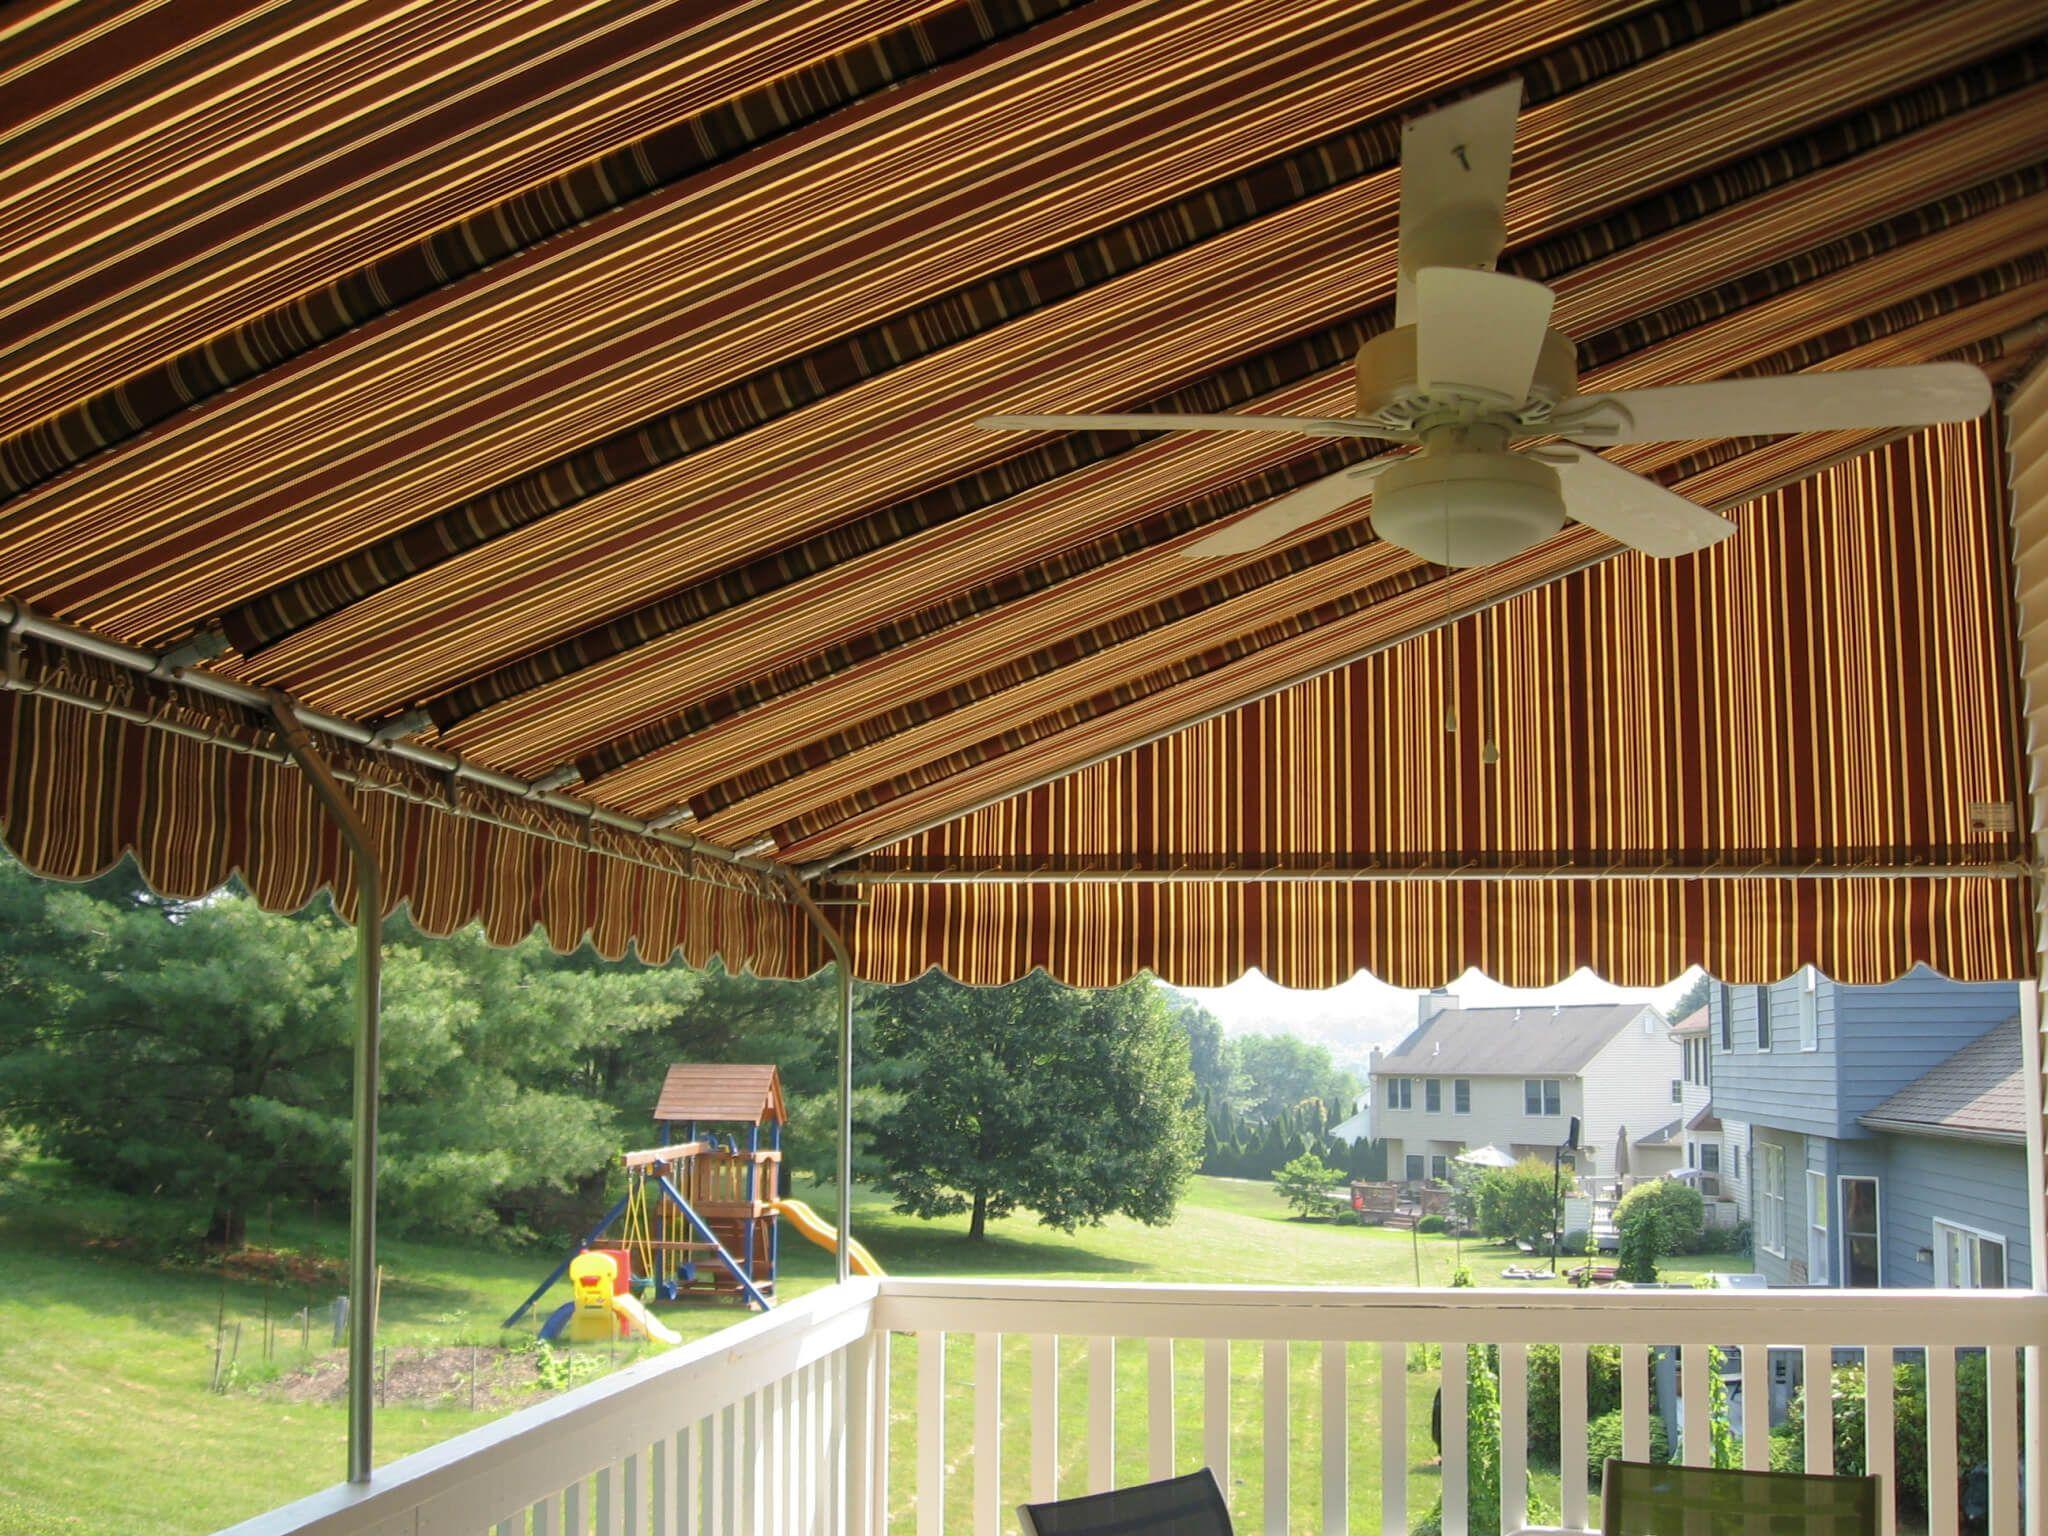 Eastland Redwood Sunbrella Awning Patioawning Homeimprovement Subrellla Outdoorliving Deckawning Patio Summer S Canopy Outdoor Patio Canopy Deck Canopy